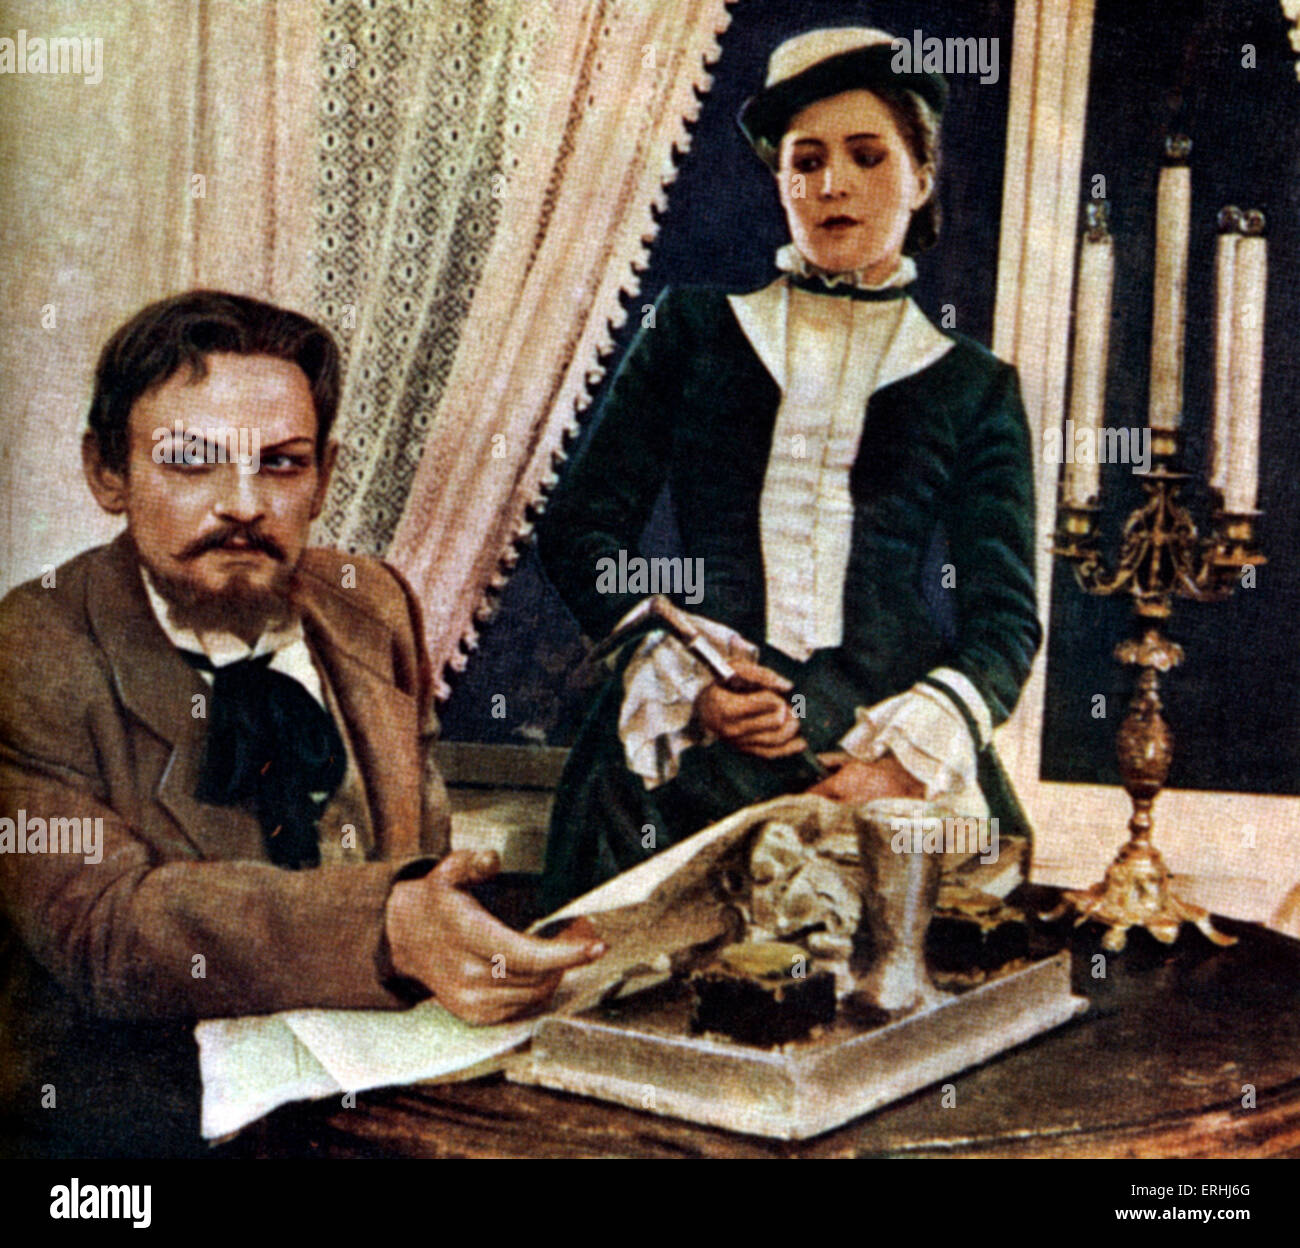 Anton Chekhov 's play 'Ivanov' (1887), with C. Lavrov and Sasha K. Tuzova. Illustration from the Russian - Stock Image